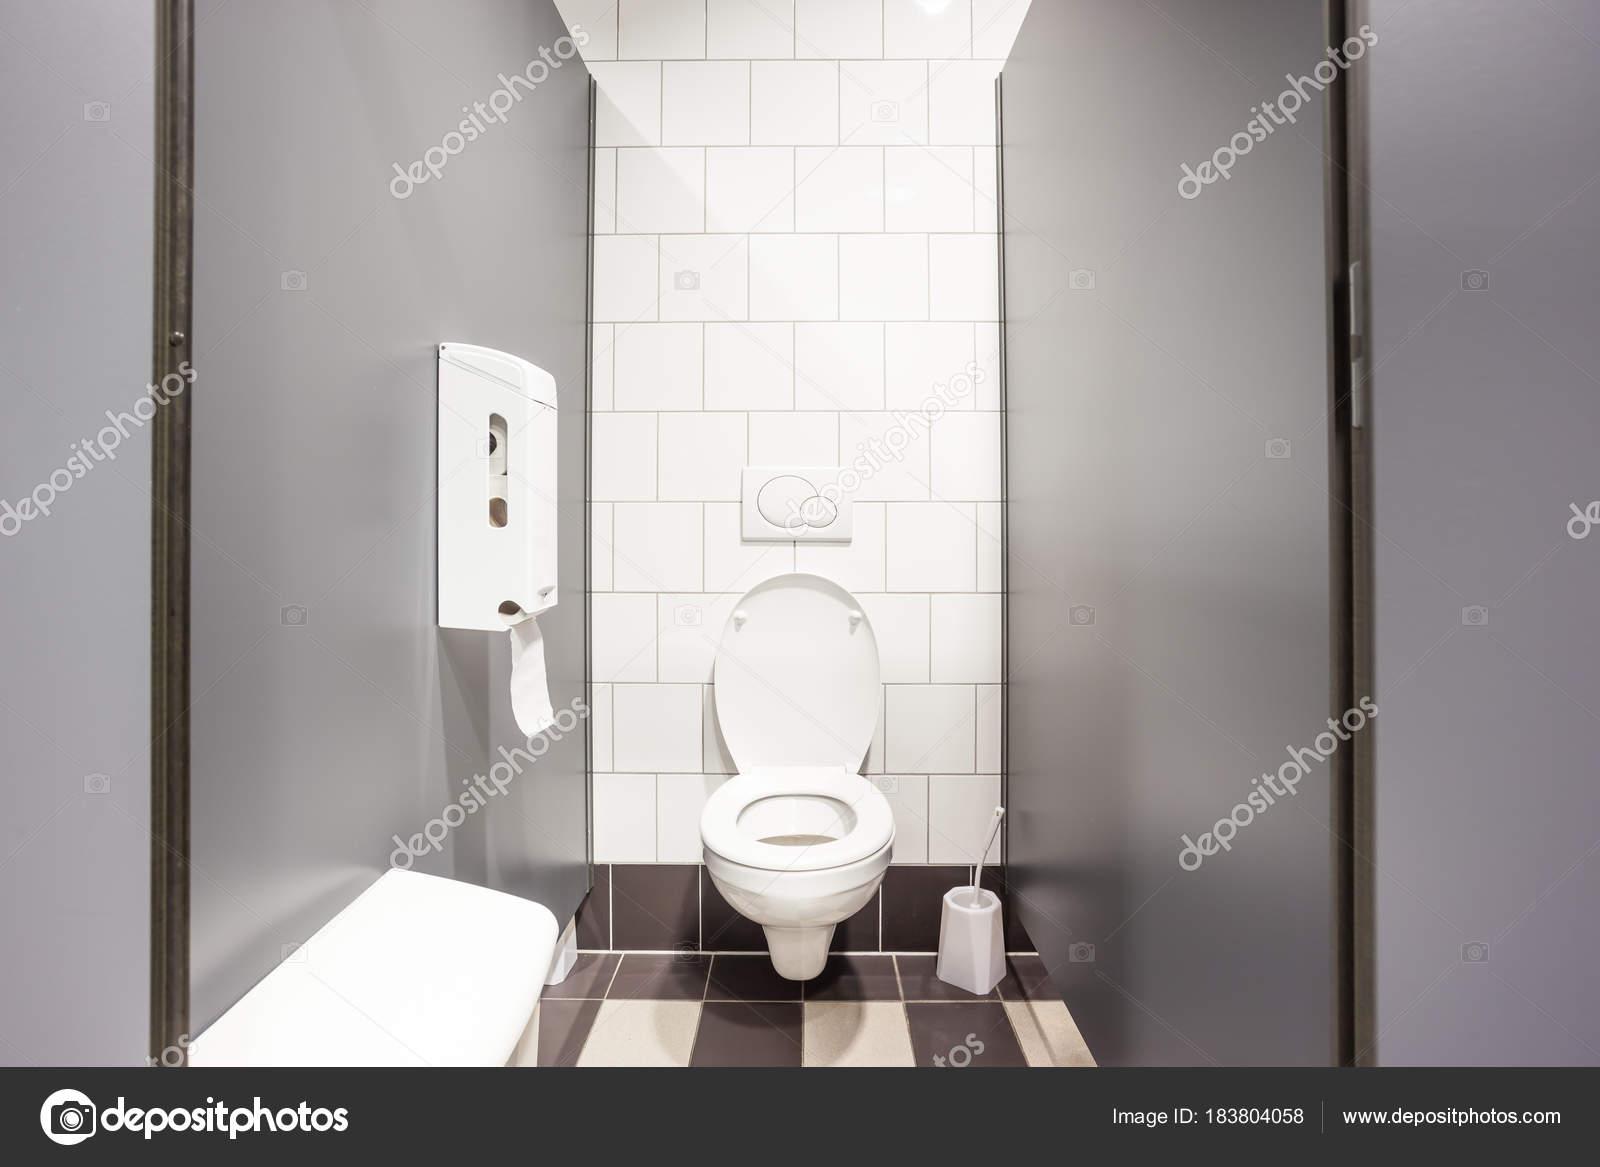 public toilet — Stock Photo © DenBoma #183804058